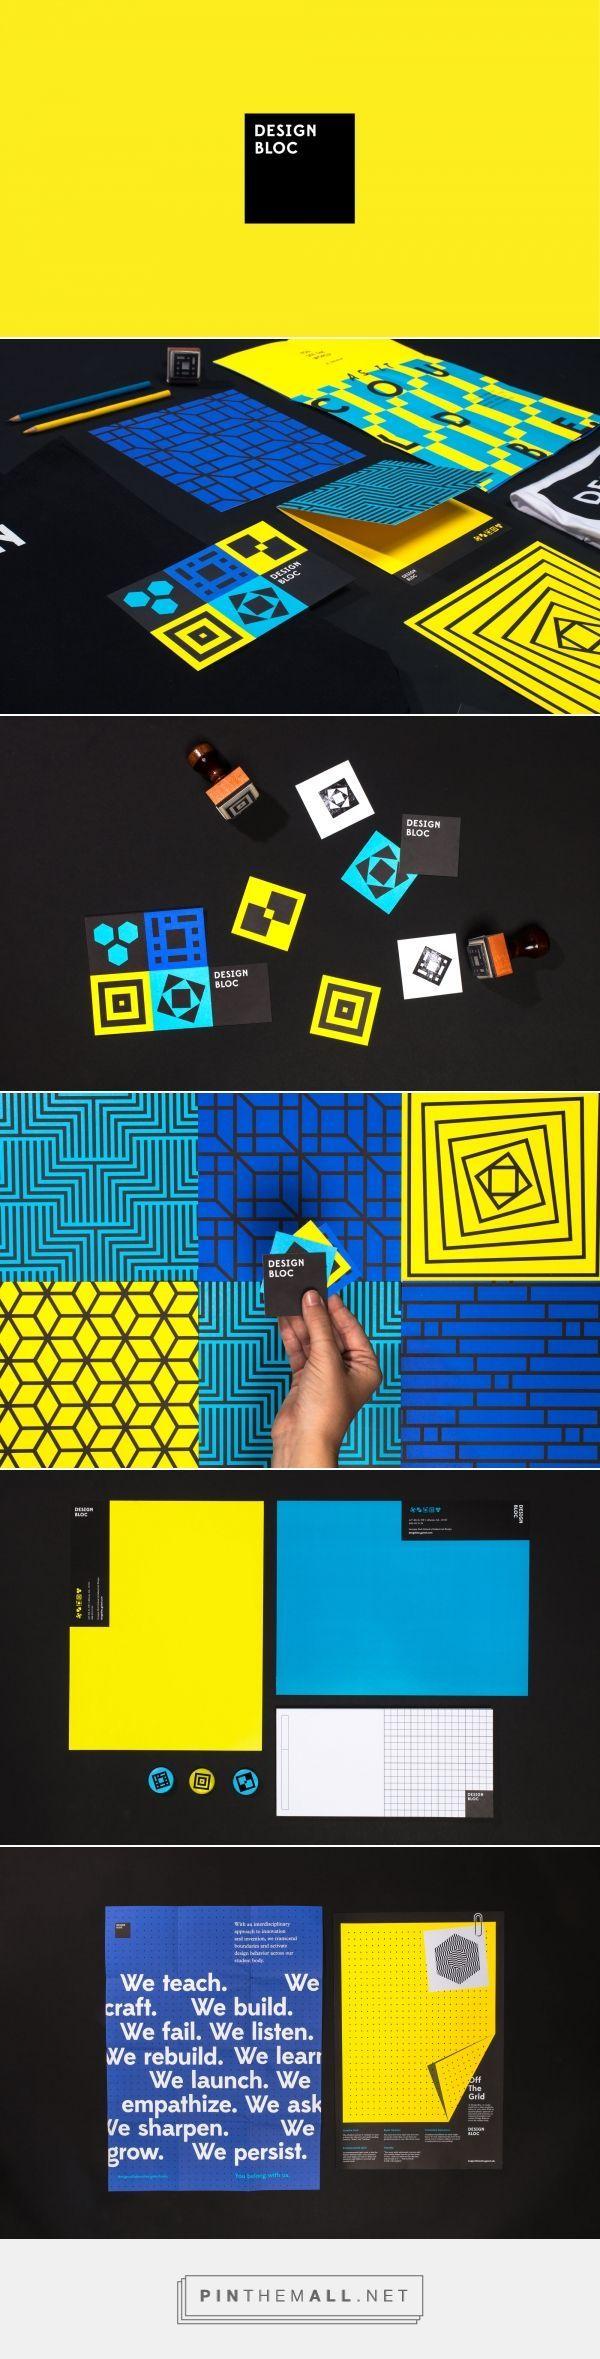 Design Bloc Branding by Matchstic